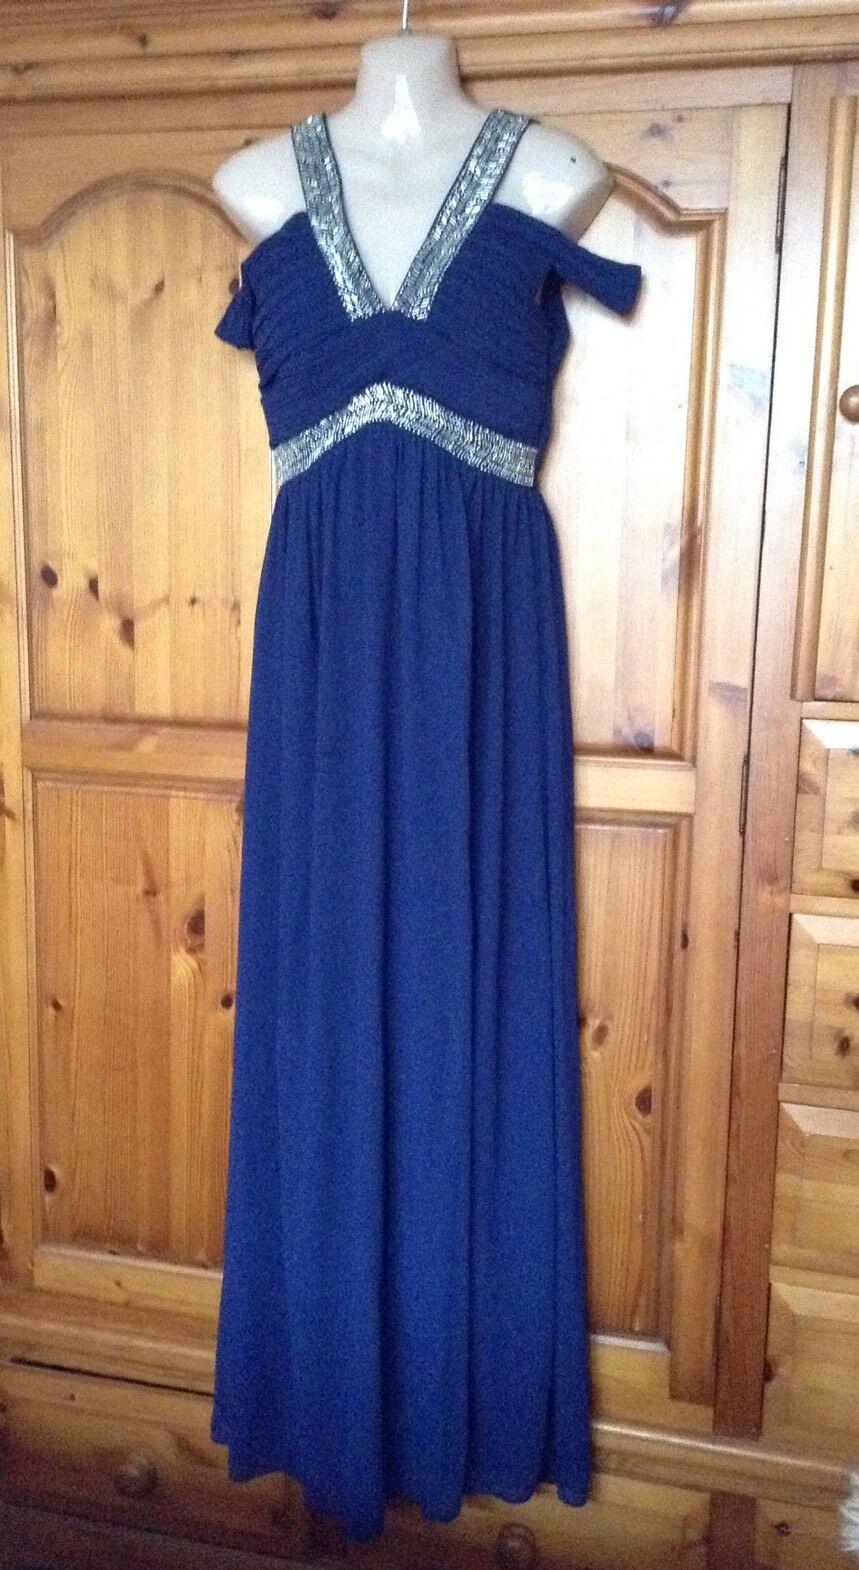 ️ Womens TFNC @ Lipsy Navy Cold shoulder embellished Maxi Dress size M 10-12  ️